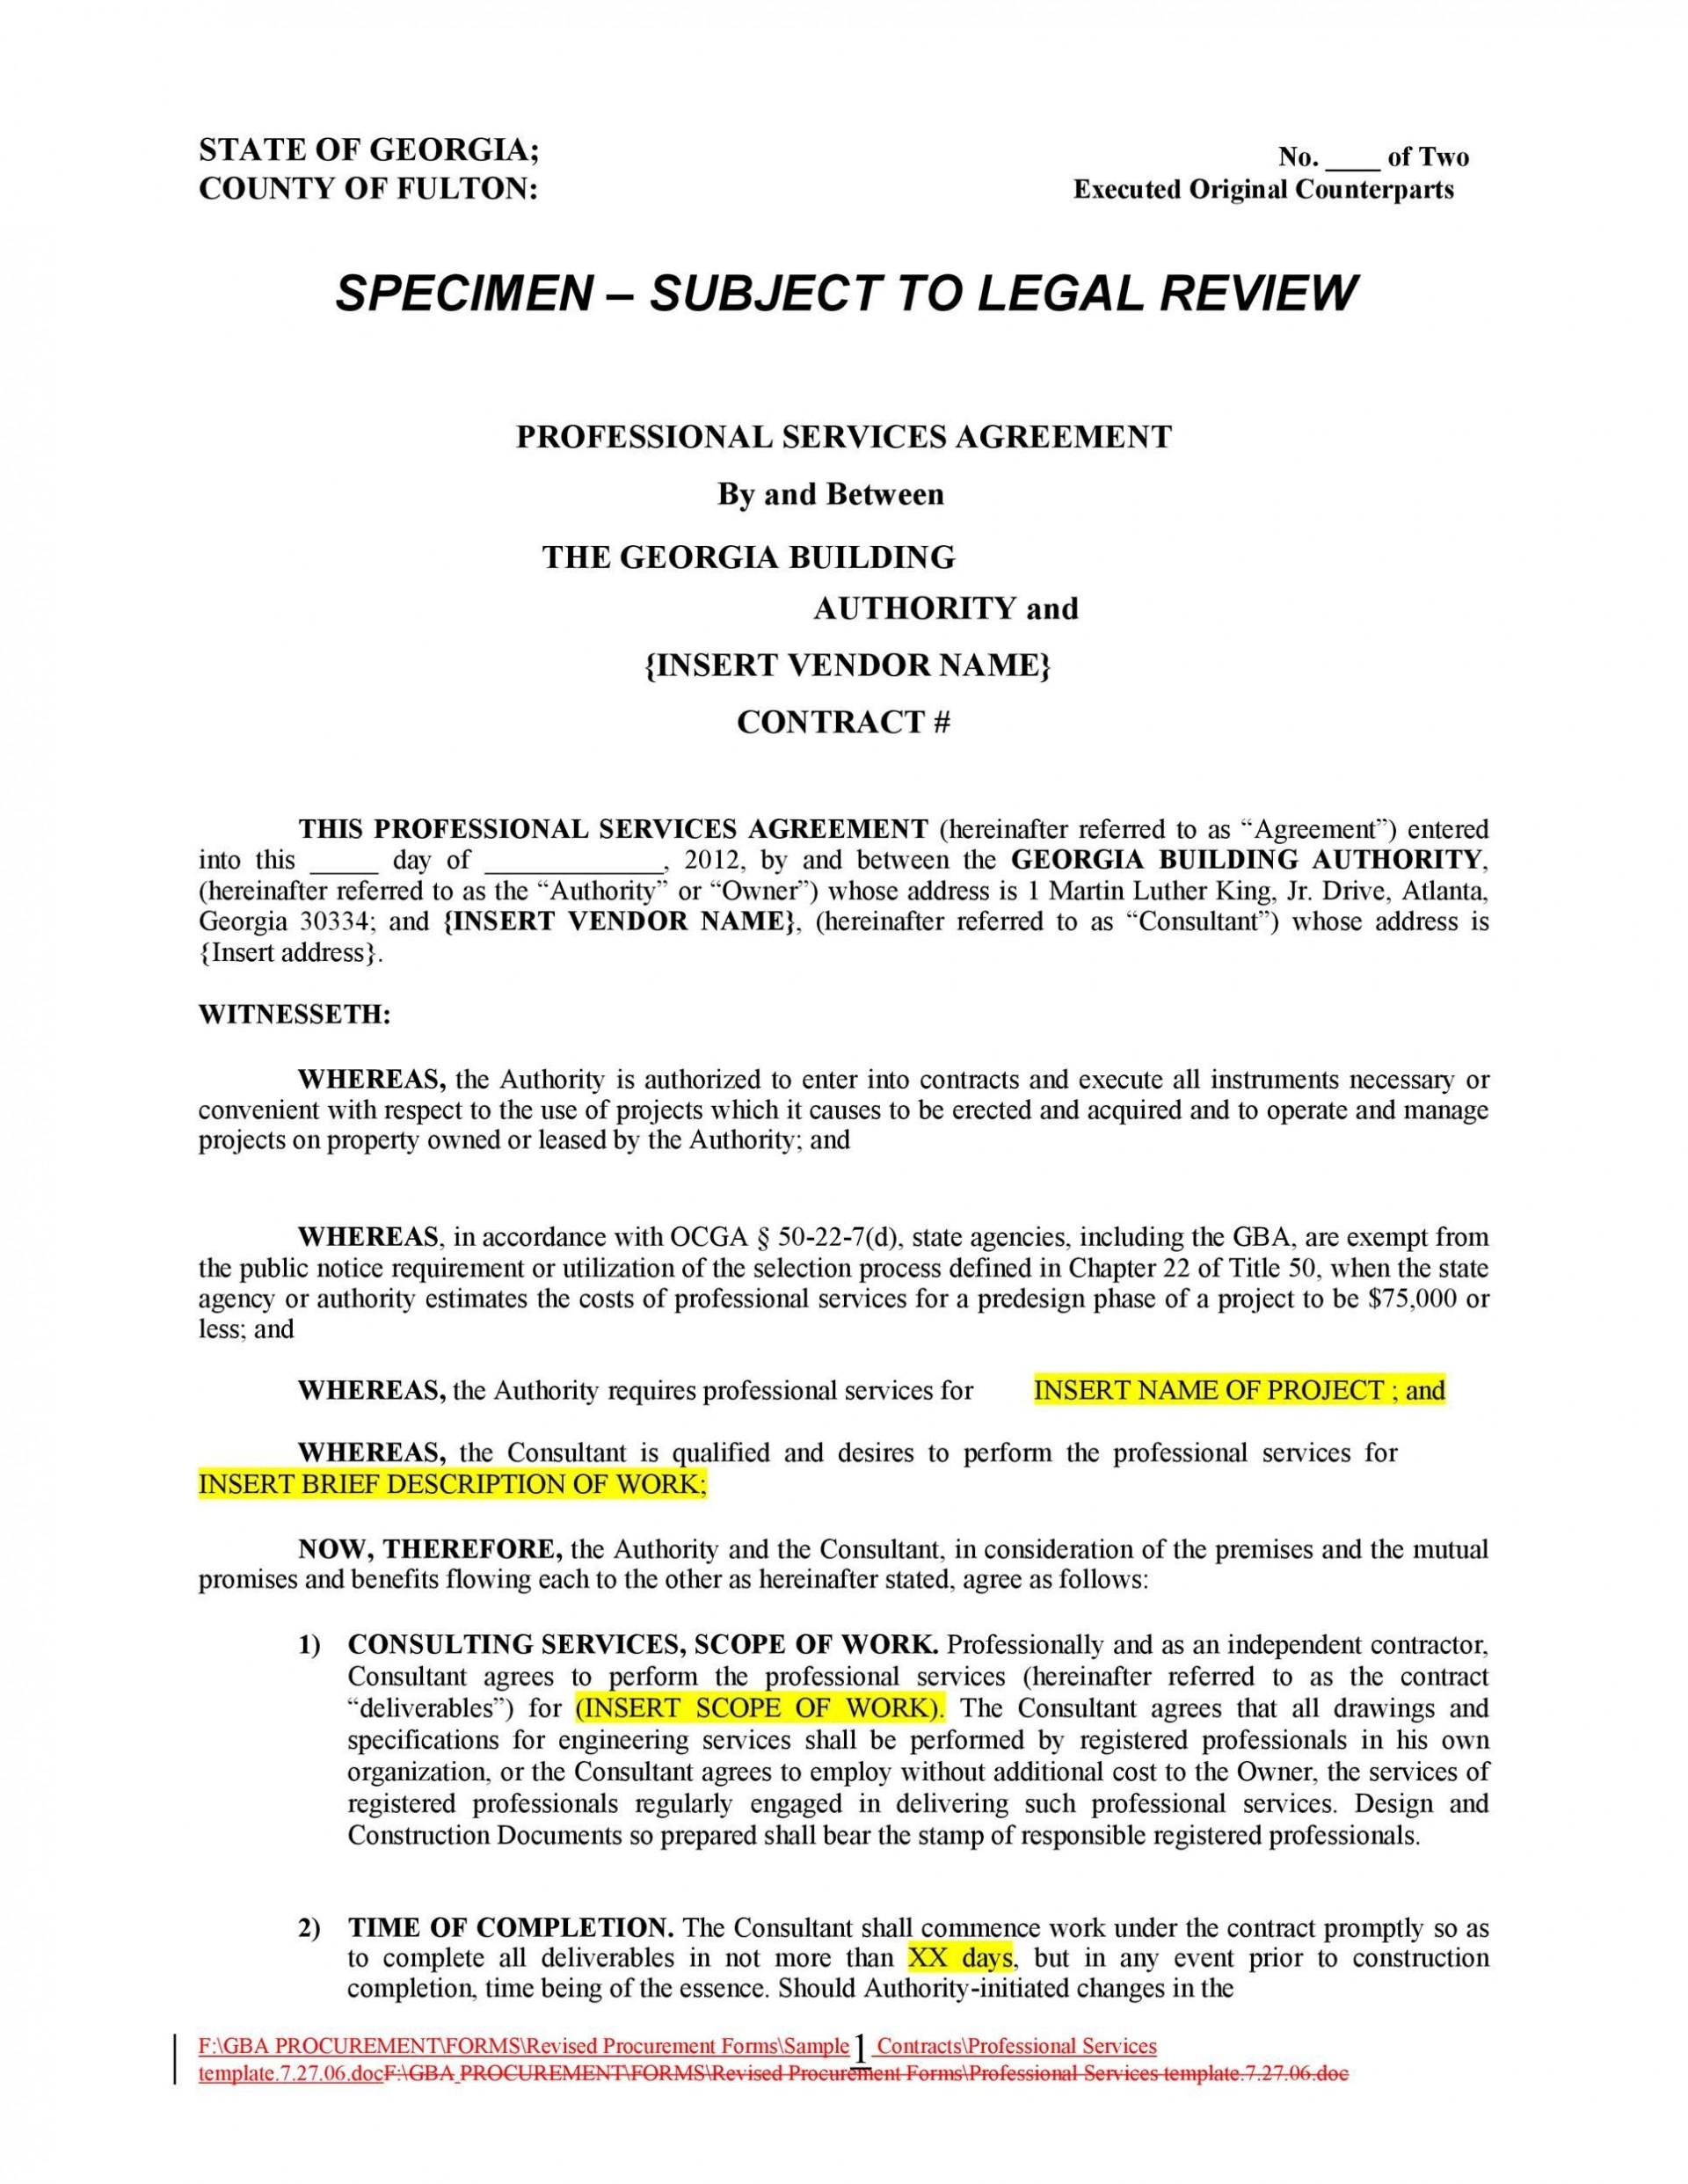 007 Stunning Master Service Agreement Template Highest Quality  Free Australia1920